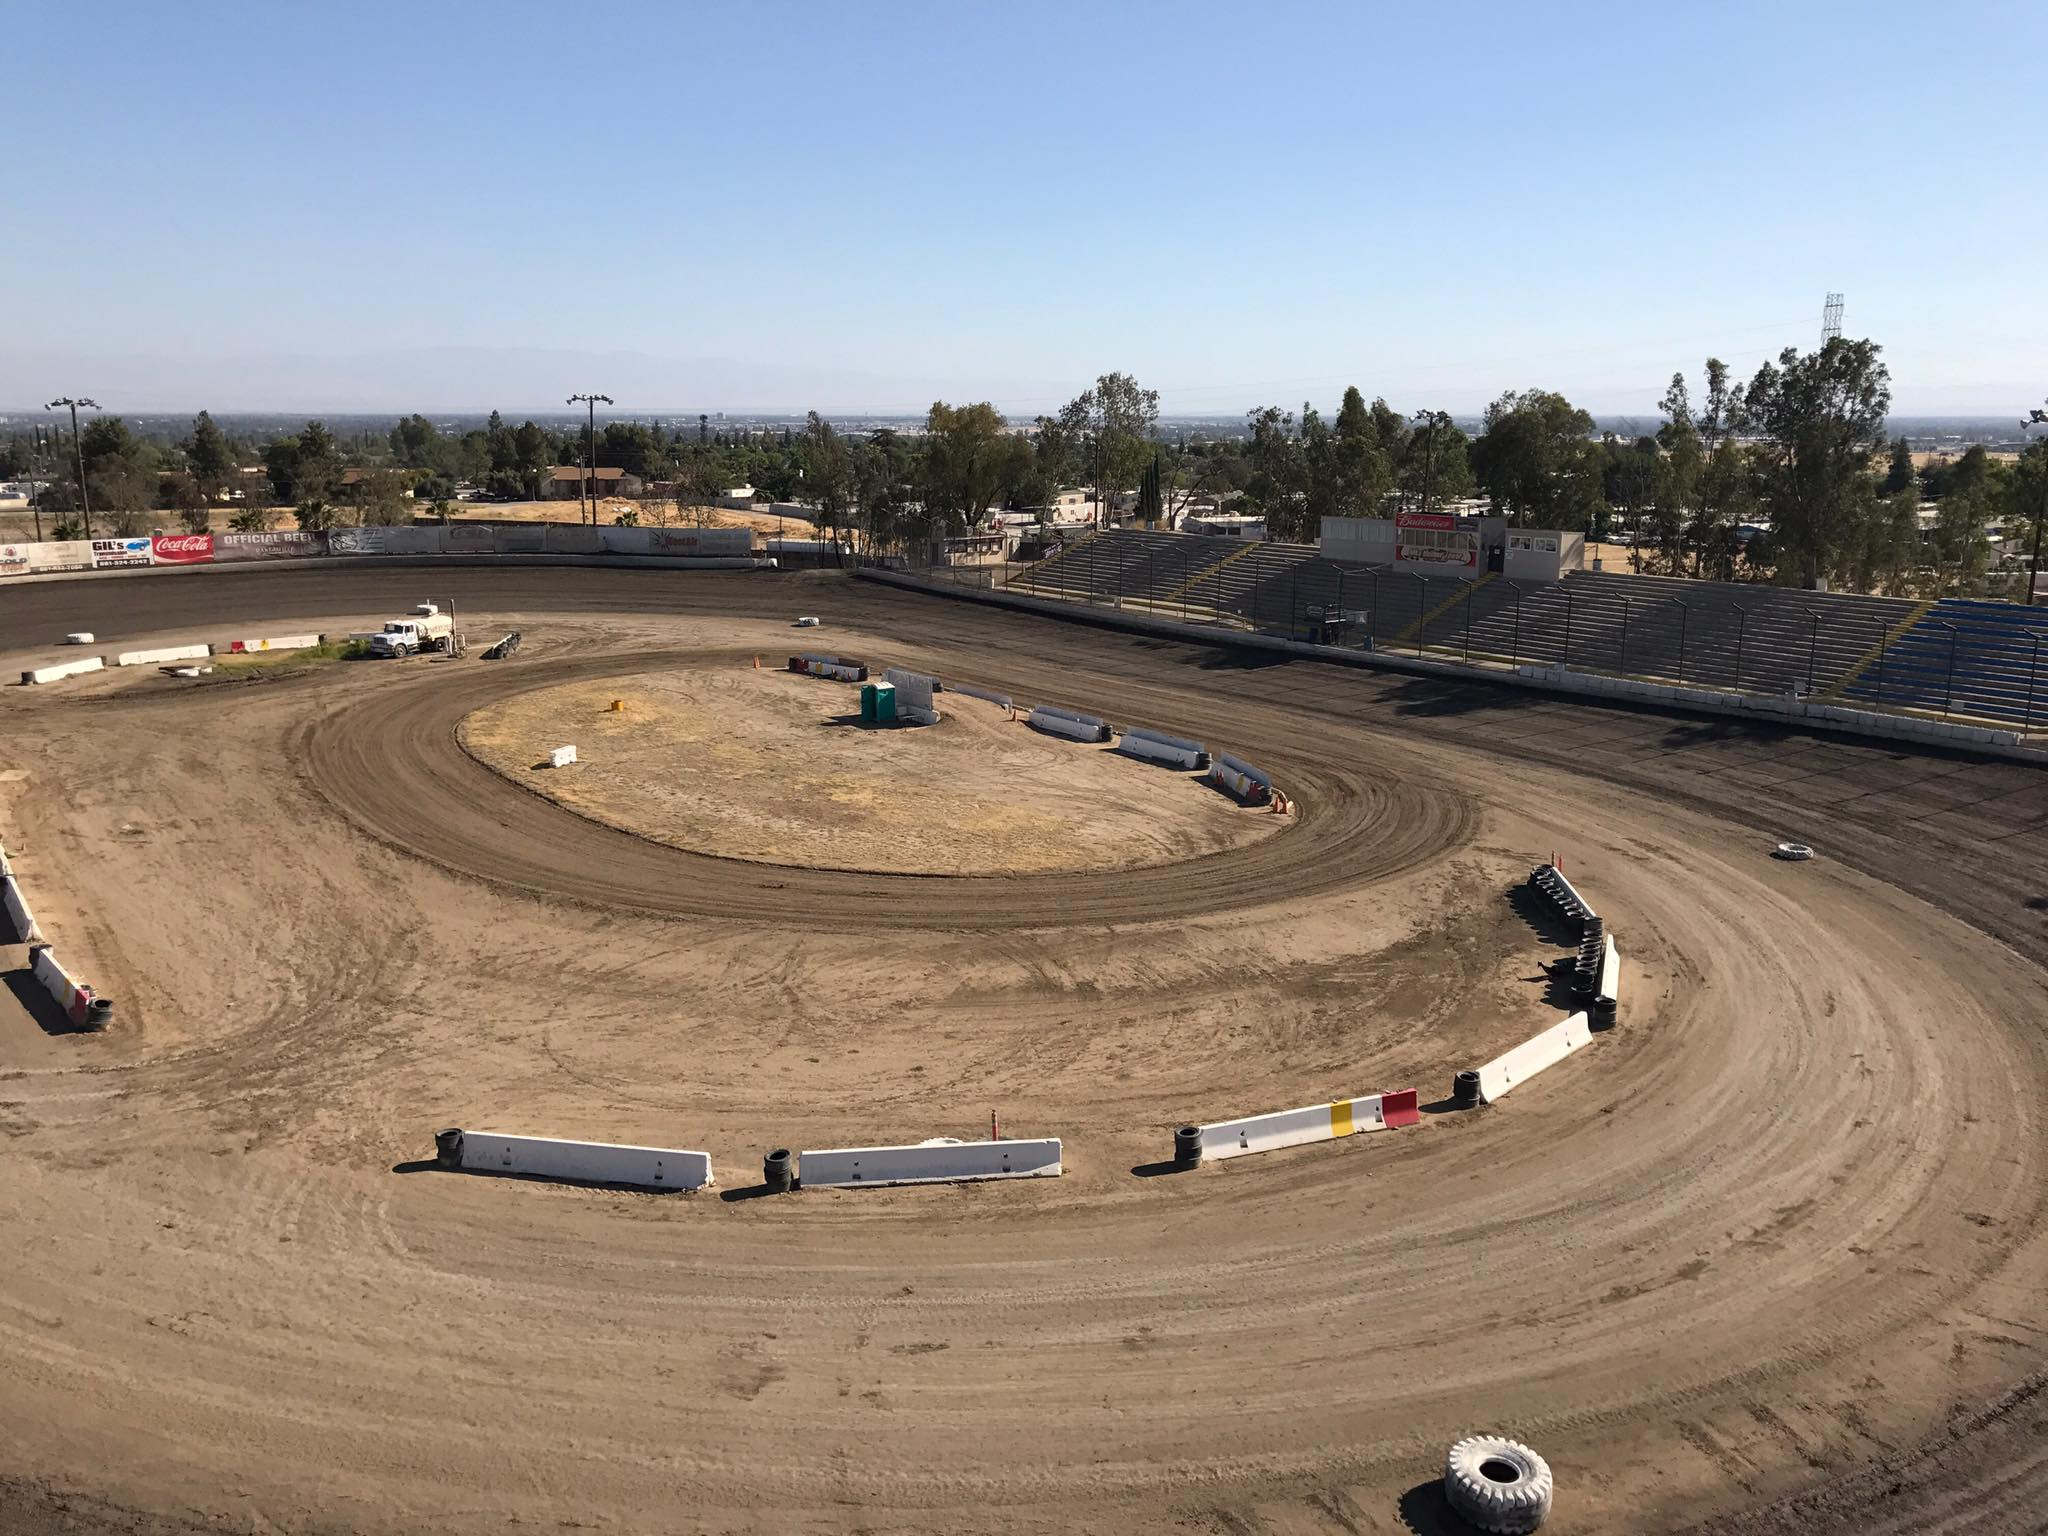 Bakesfieldfield Speedway owners lost daughter and Las Vegas Shooting